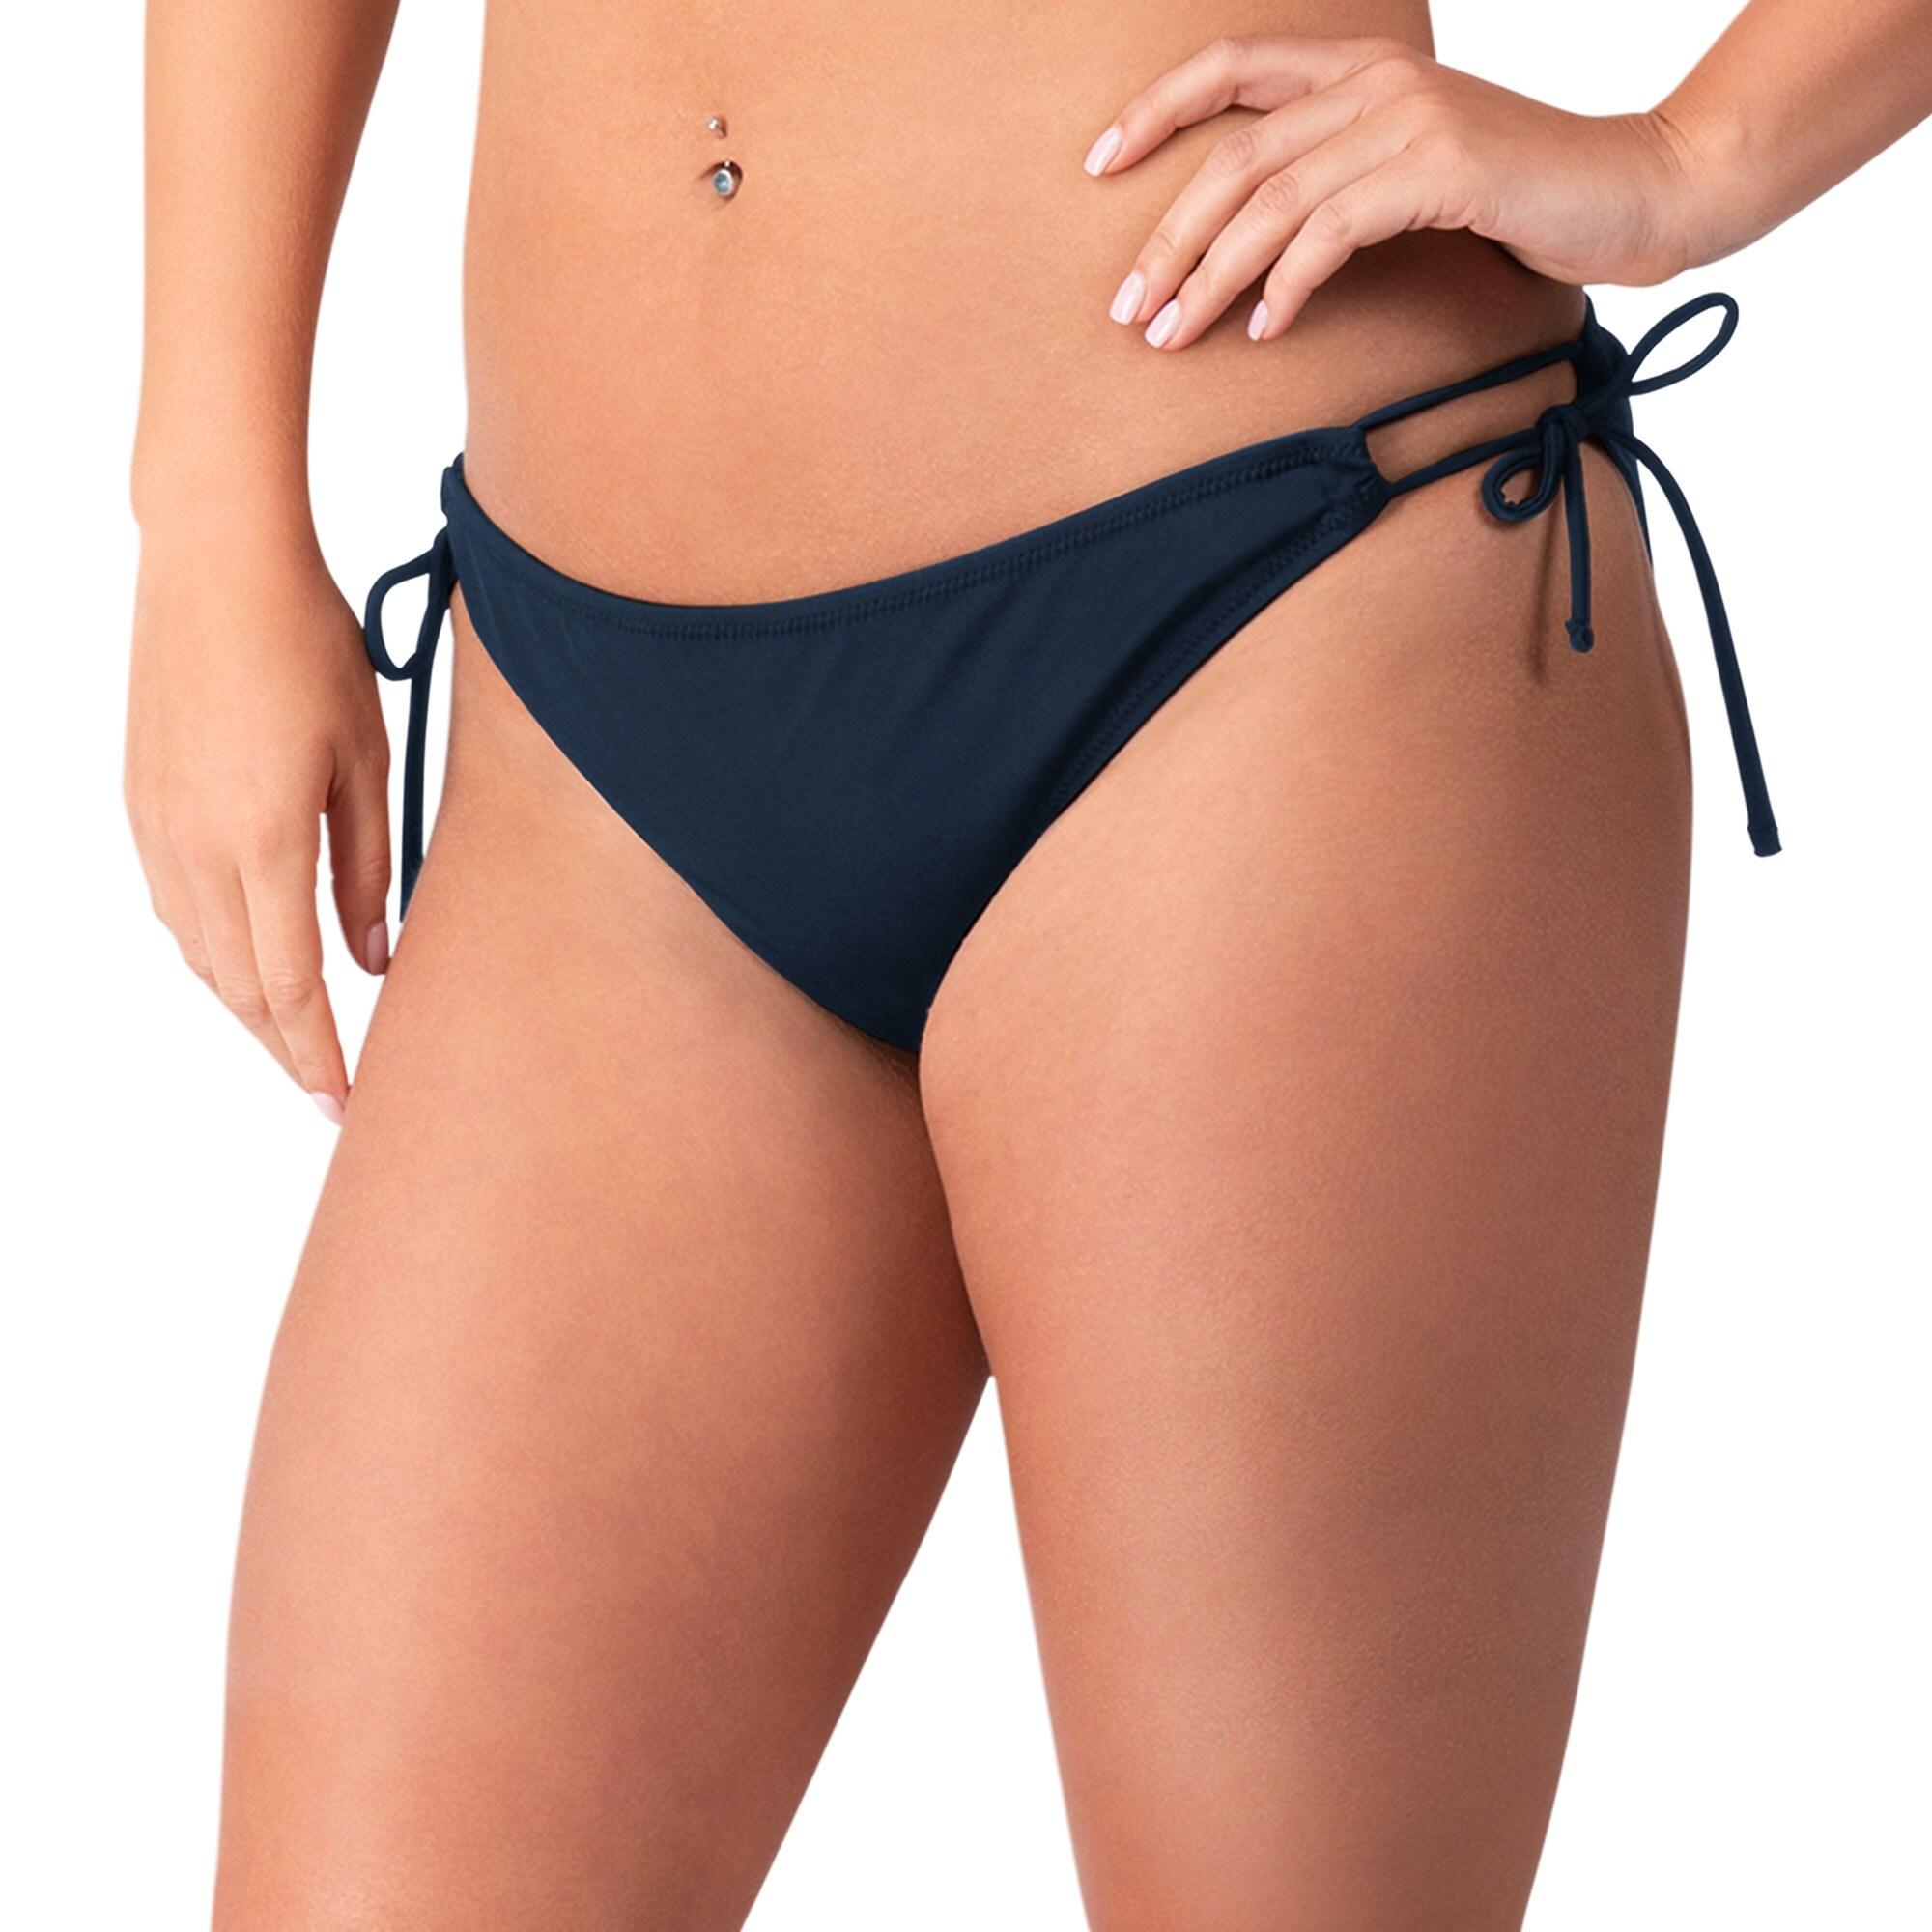 Chicago Bears G-III 4Her by Carl Banks Women's Without Limits Bikini Bottom - Navy